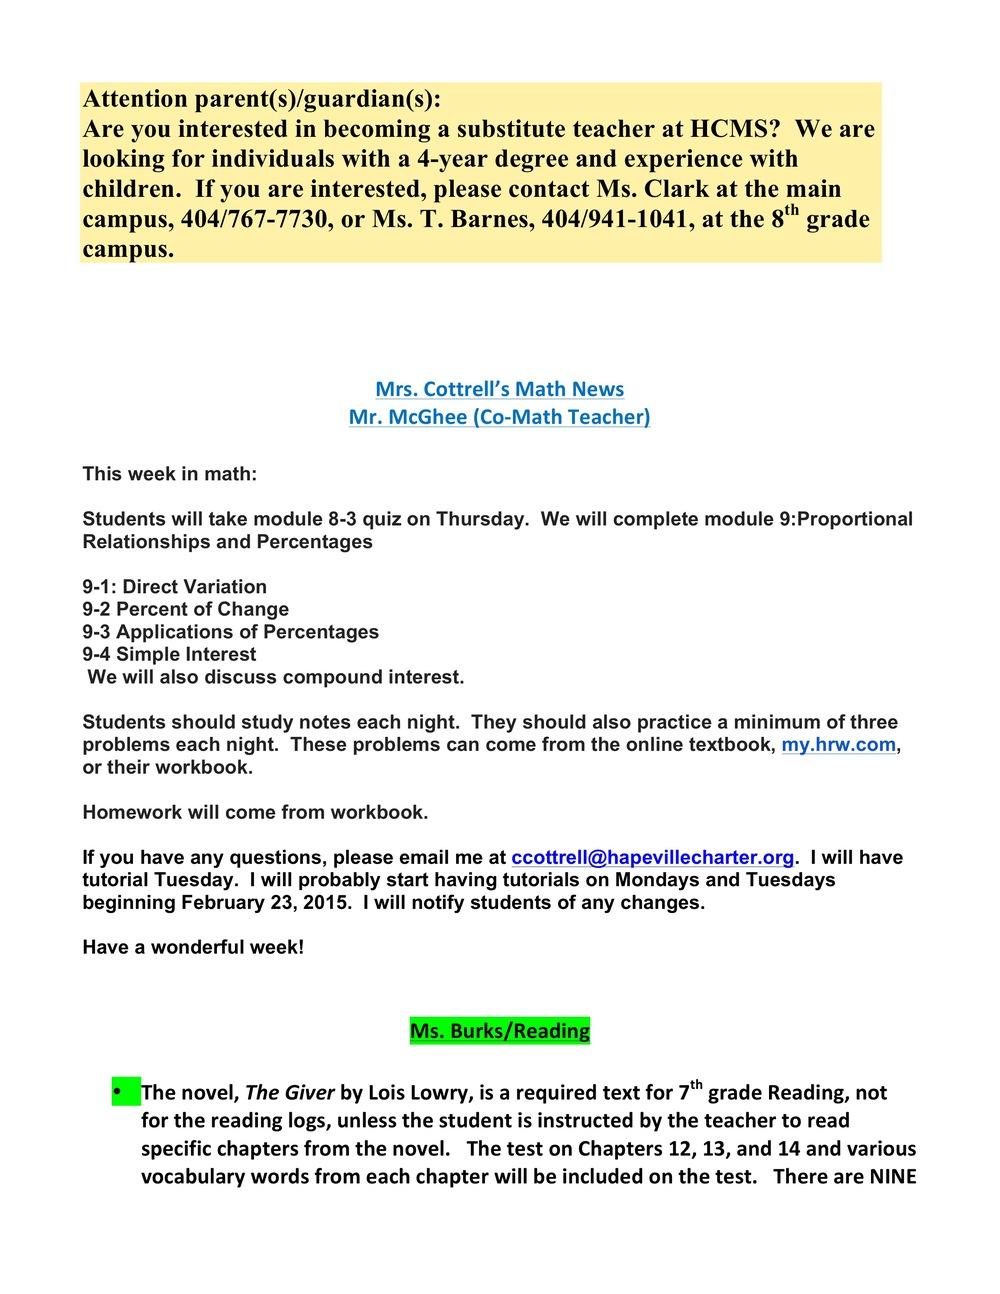 Newsletter Image7th grade feb 16th 2.jpeg